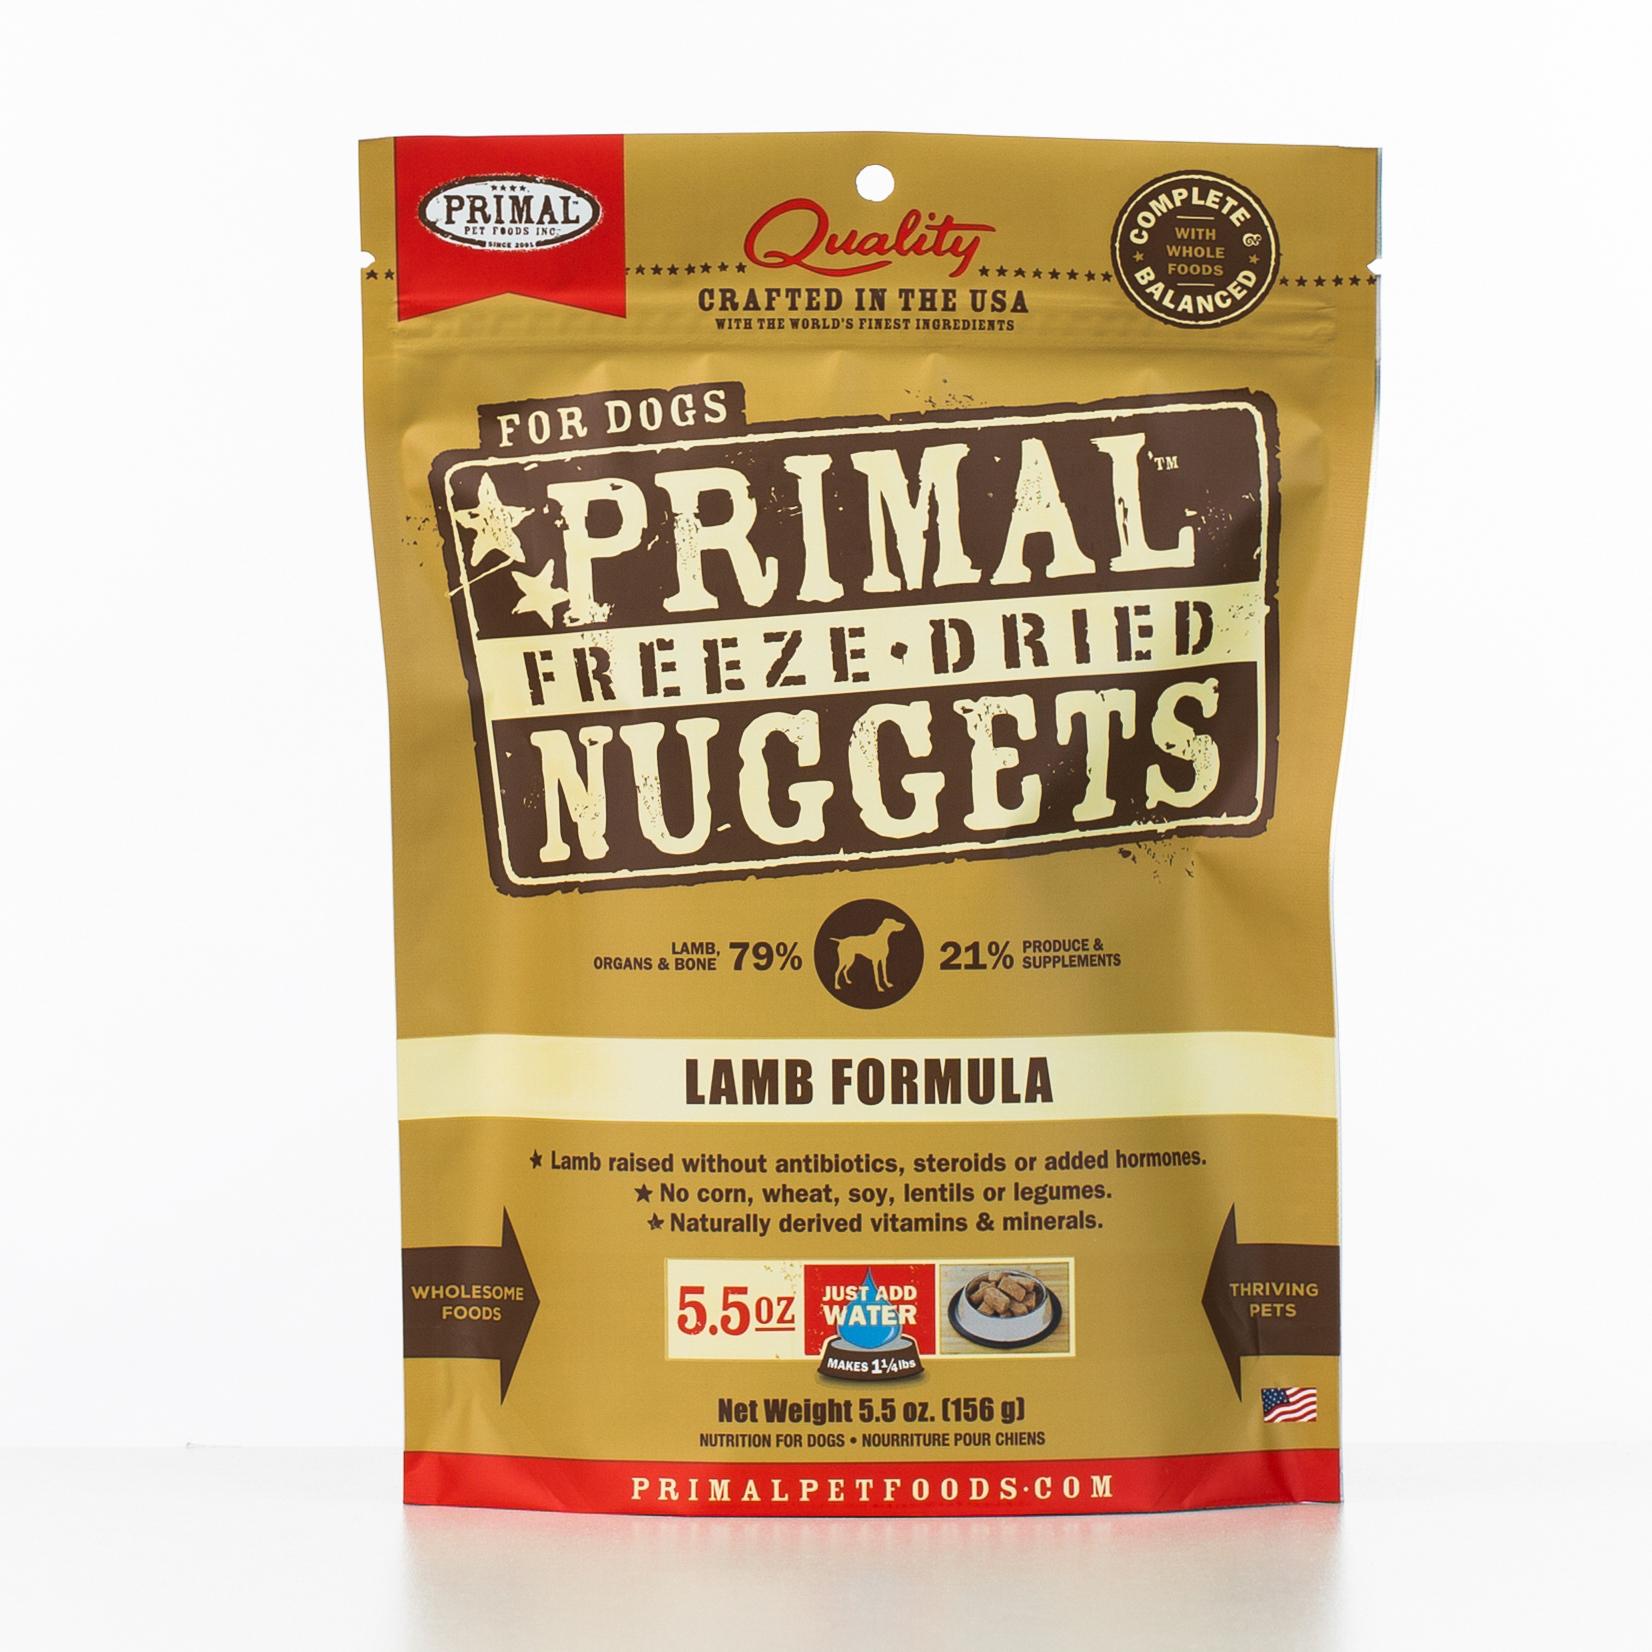 Primal Raw Freeze-Dried Nuggets Lamb Formula Dog Food Image